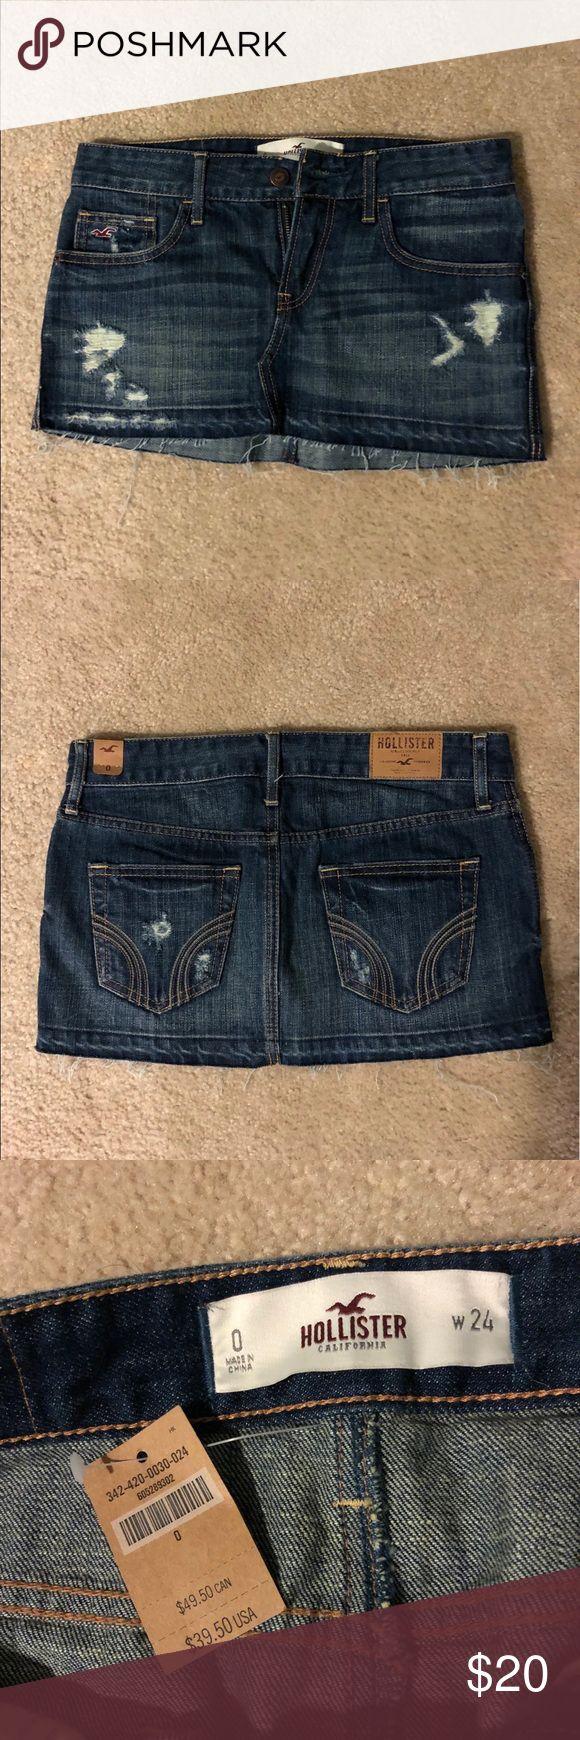 Jean skirt Never worn size 0 Hollister skirt! Hollister Skirts Mini